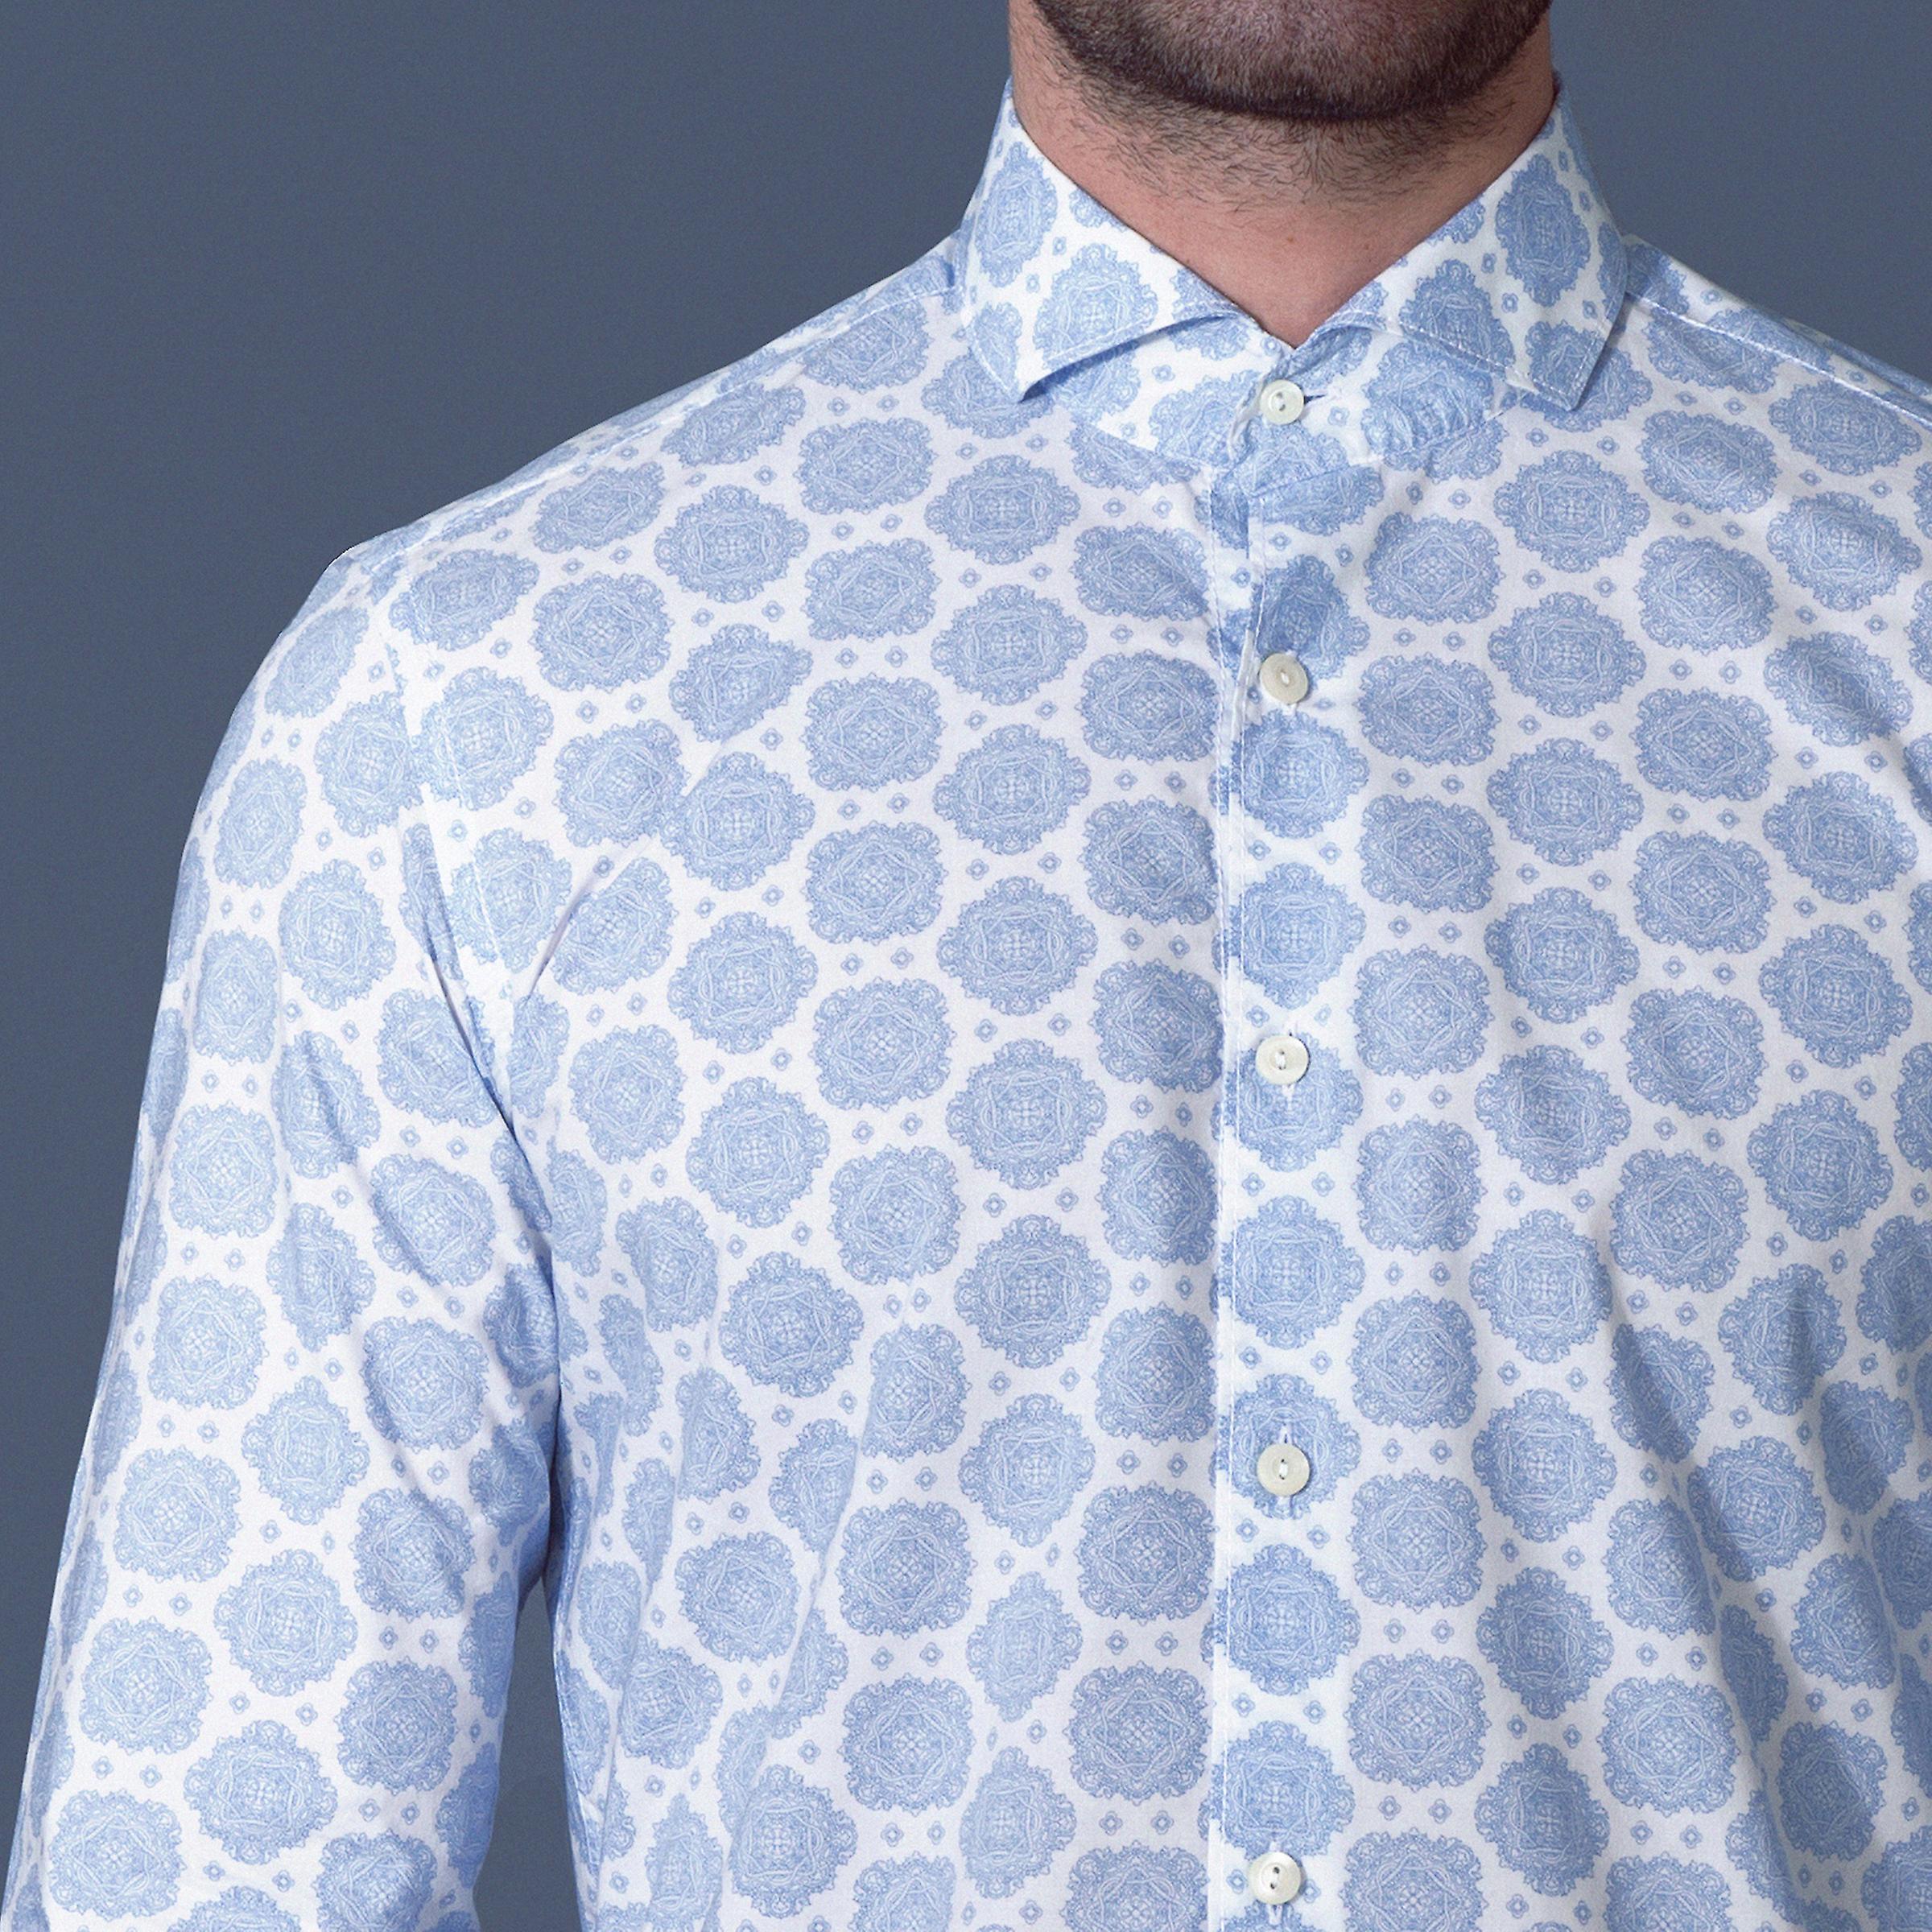 Fabio Giovanni Lazio Shirt - Mens Italian Casual Stylish Shirt 100% Cotton - Long Sleeve